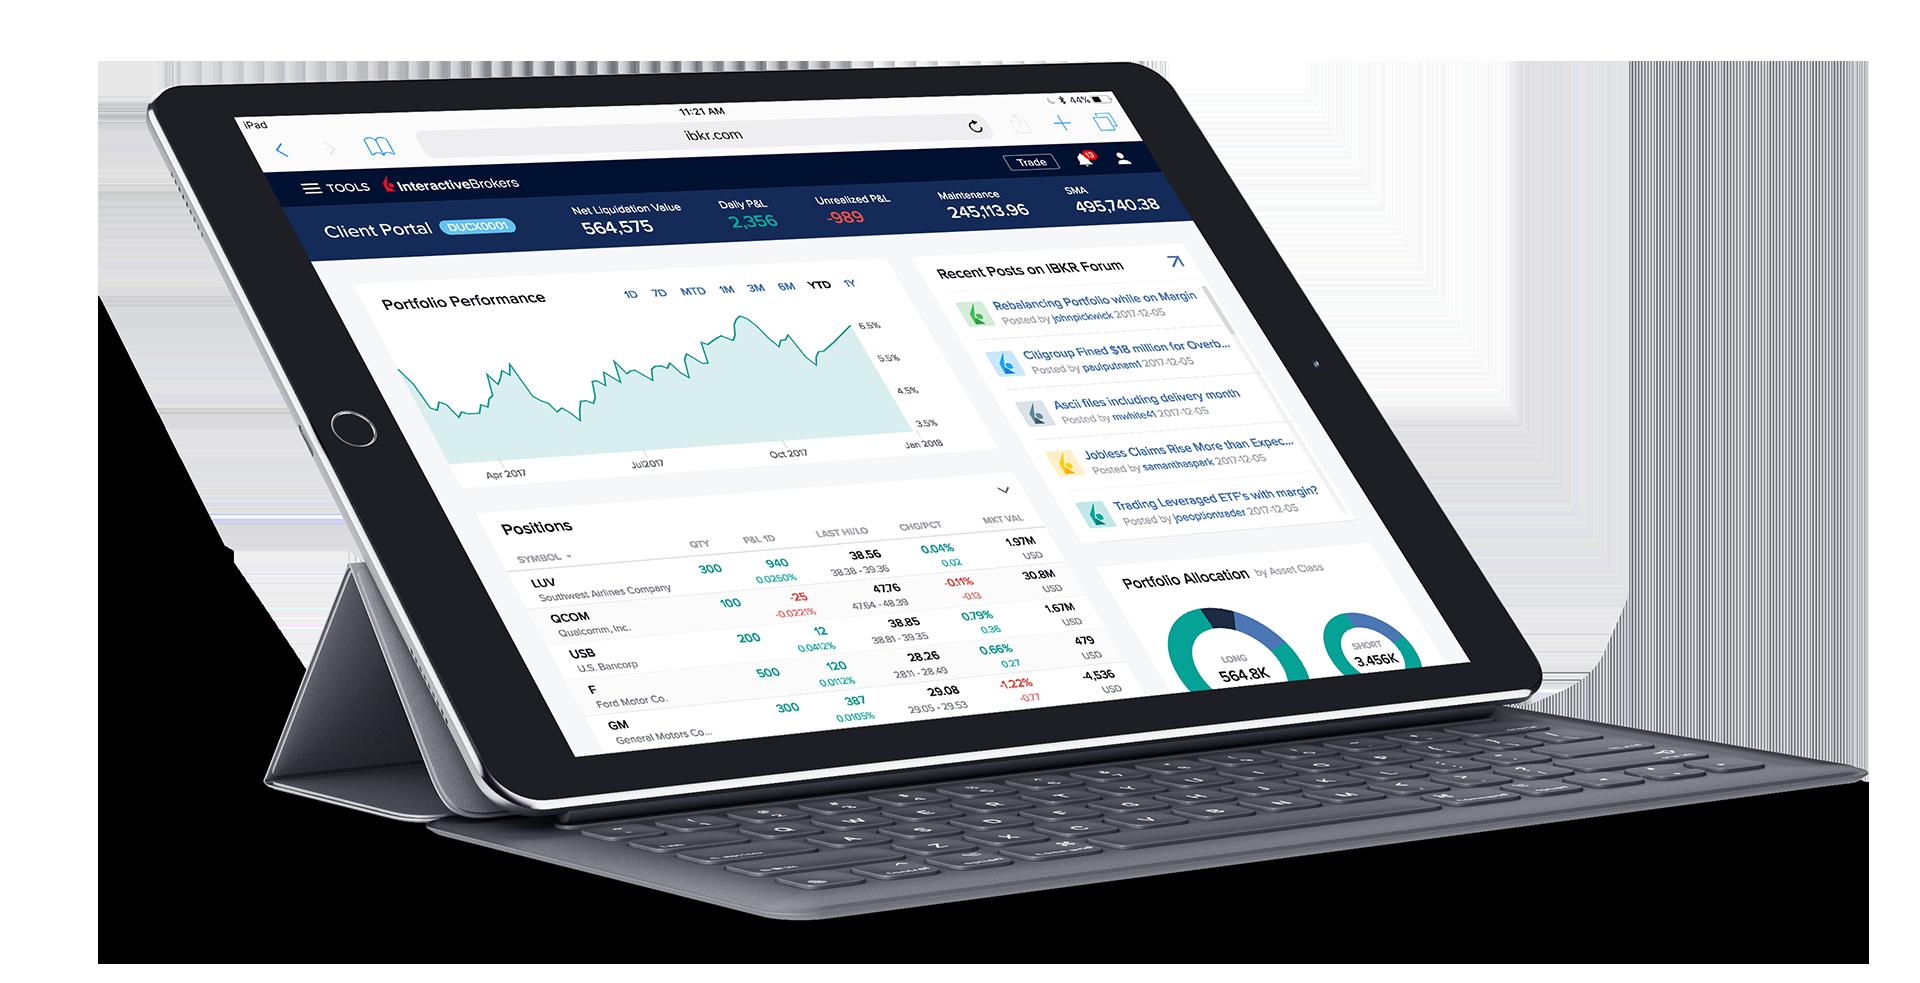 IBKR Trading Platforms | Interactive Brokers